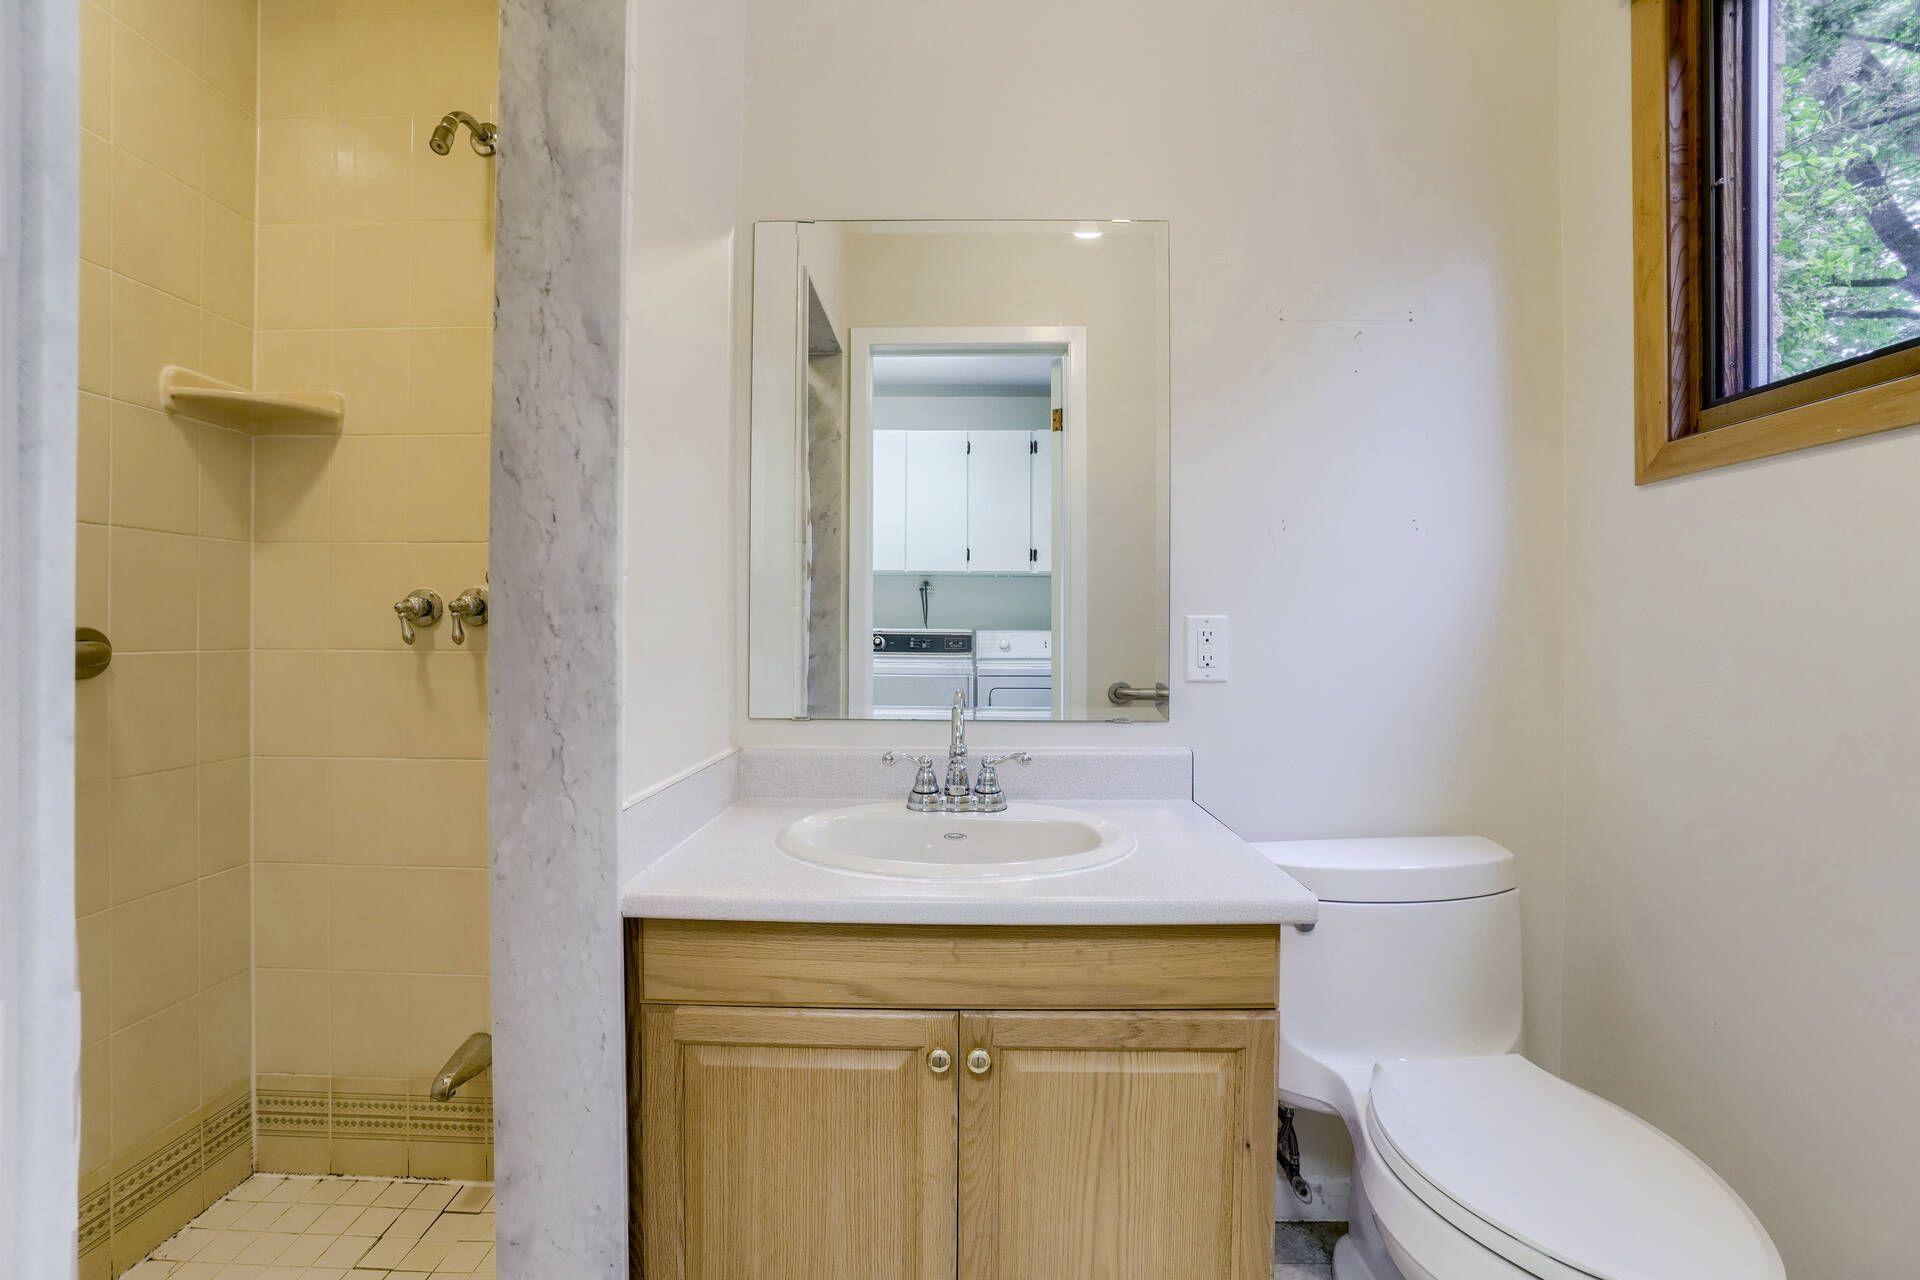 Bathroom - 169 Wedgewood Dr, Oakville - Elite3 & Team at 169 Wedgewood Drive, Eastlake, Oakville